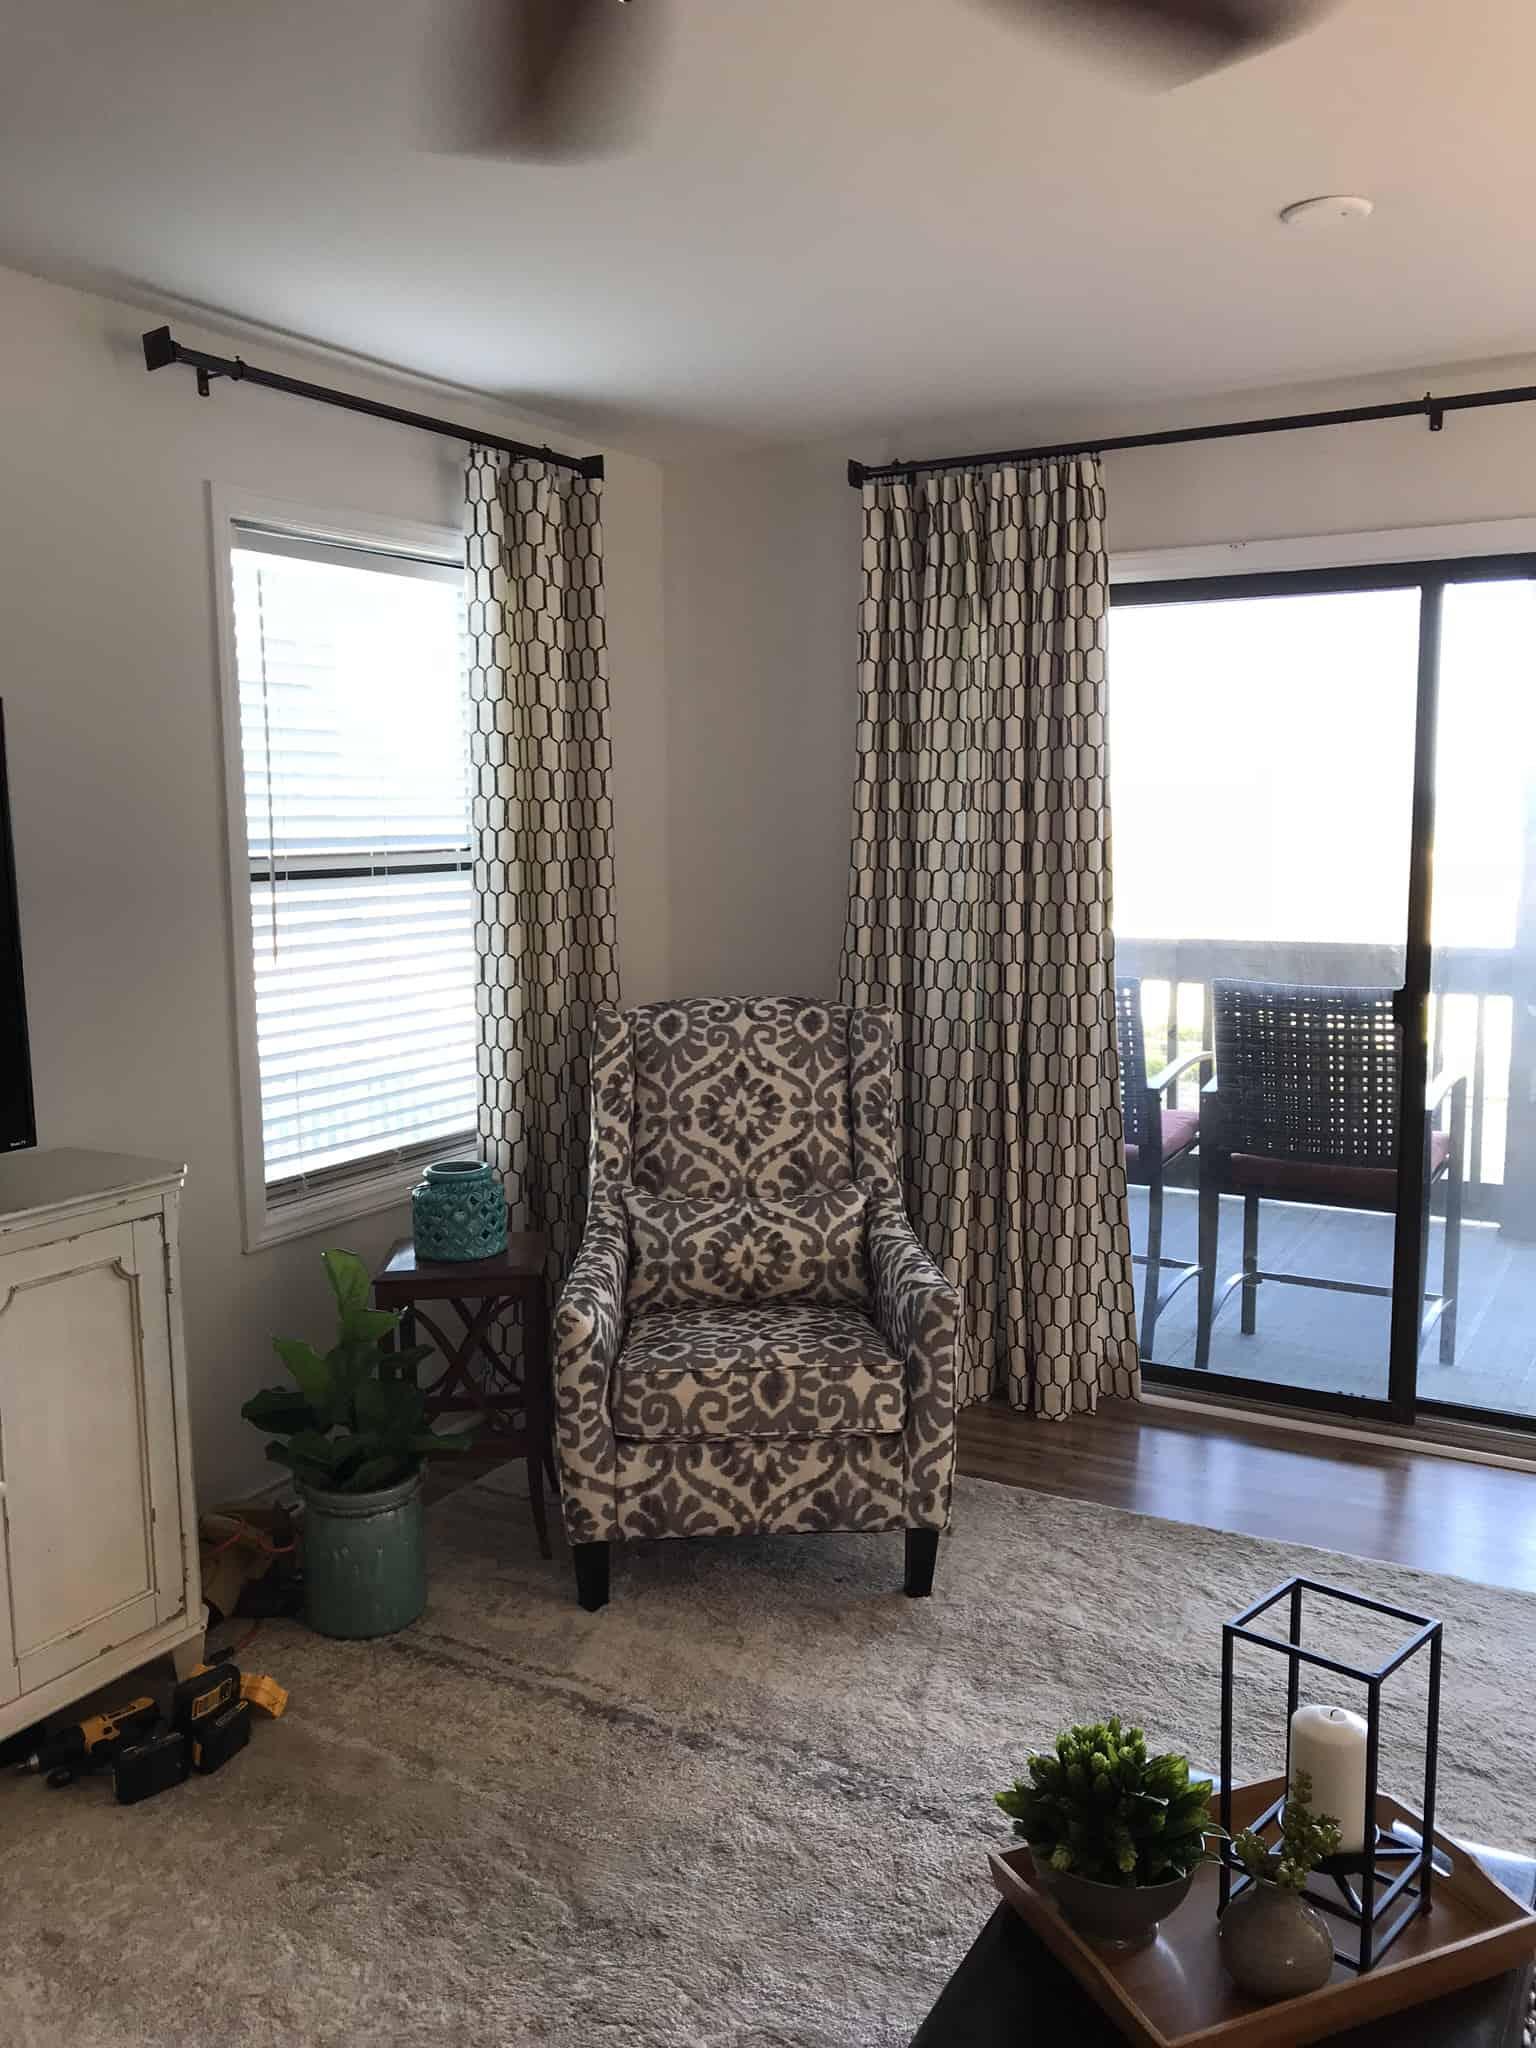 DIY drapery panels